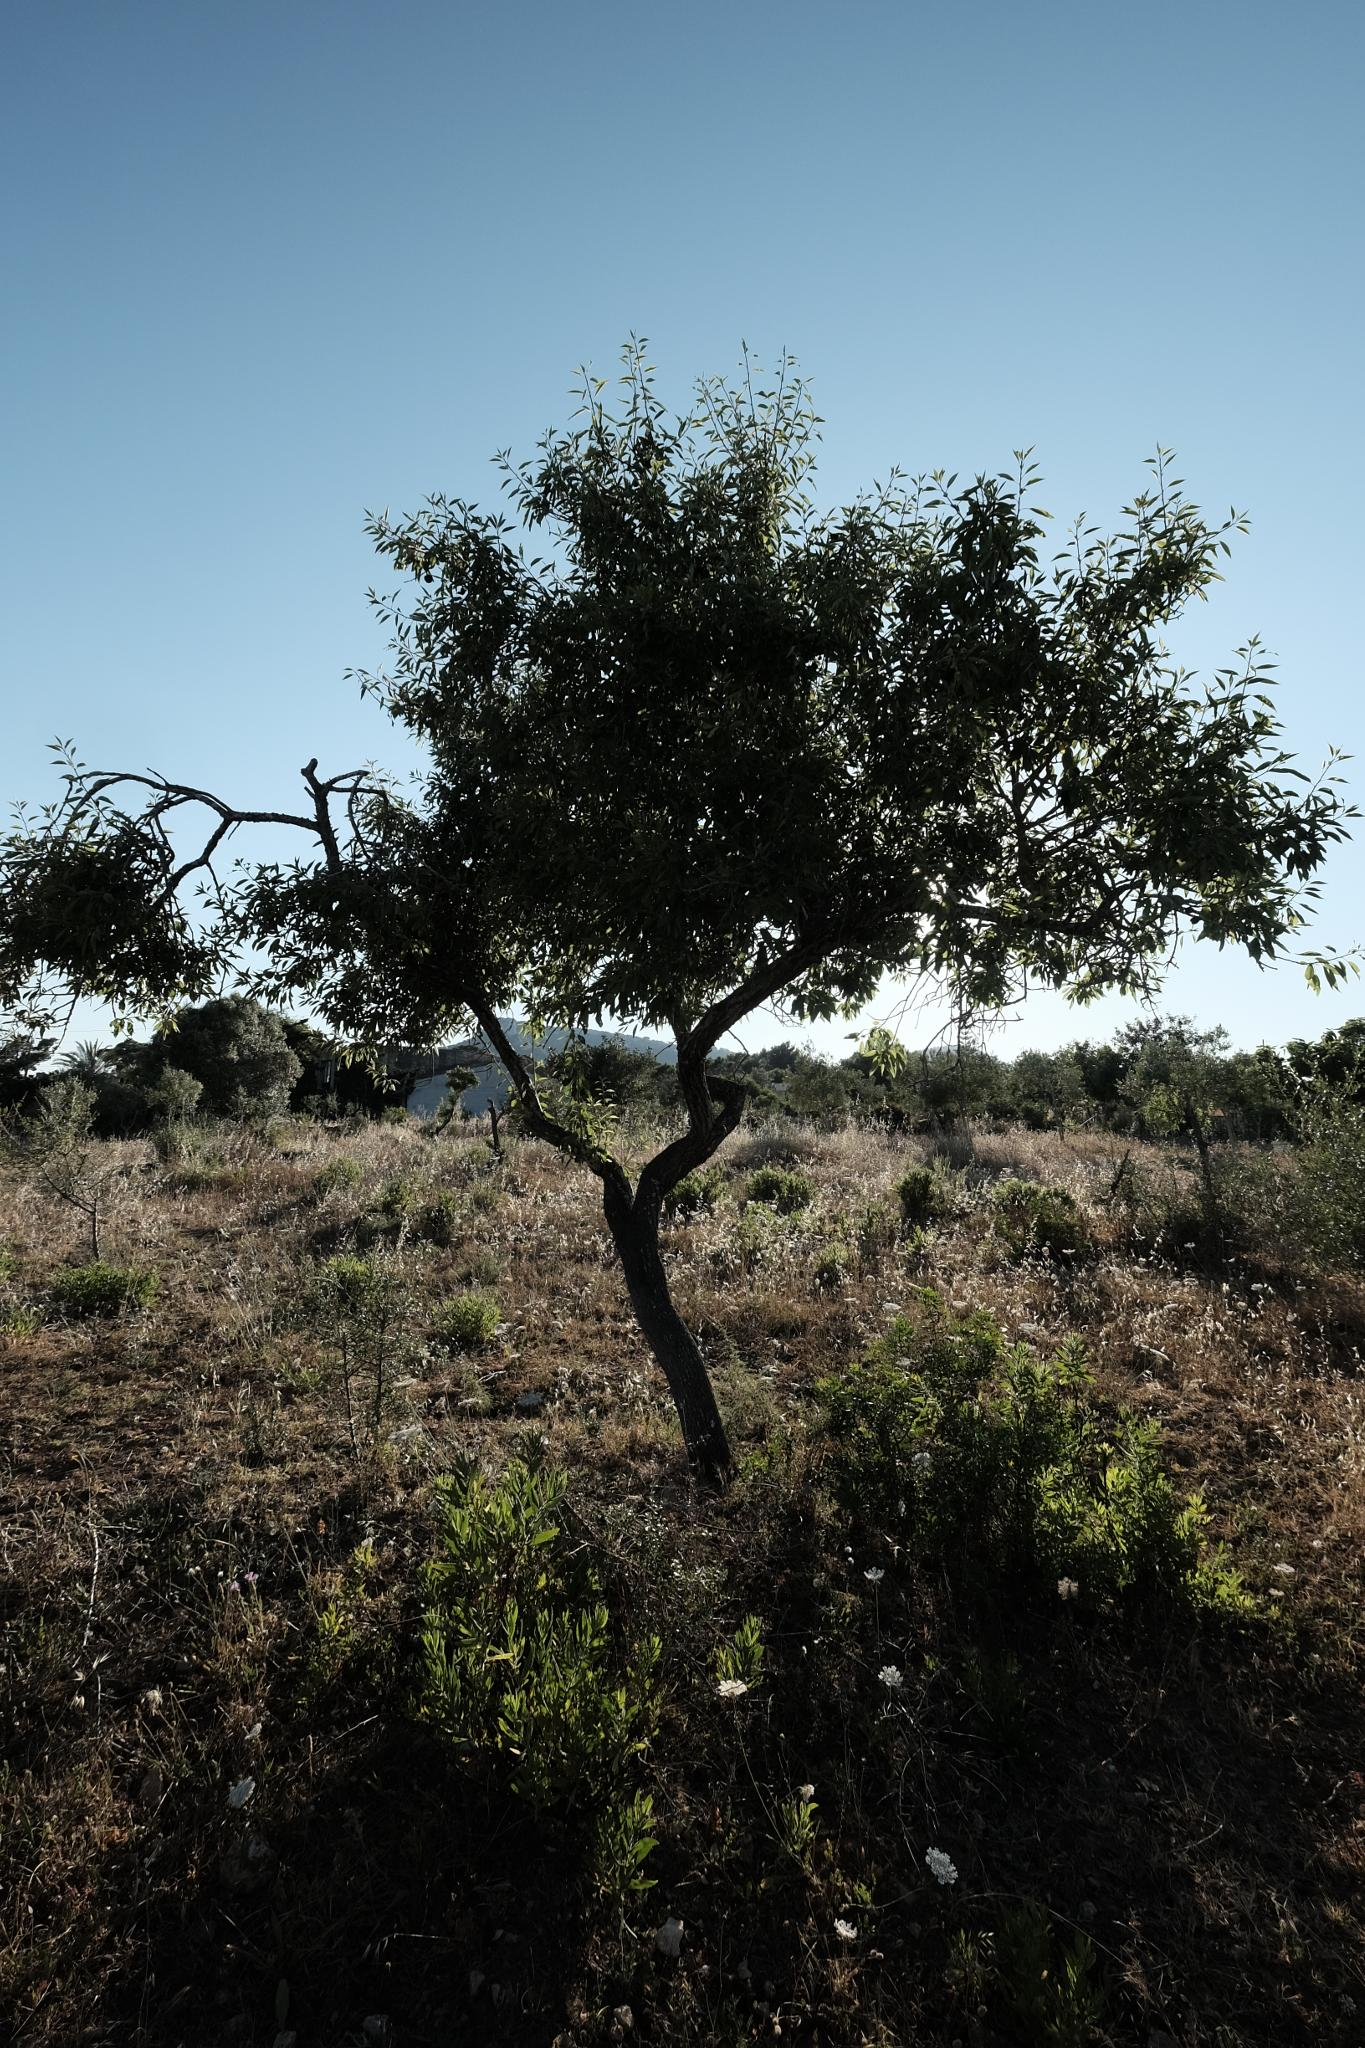 mallorca farmland by Michael Axt